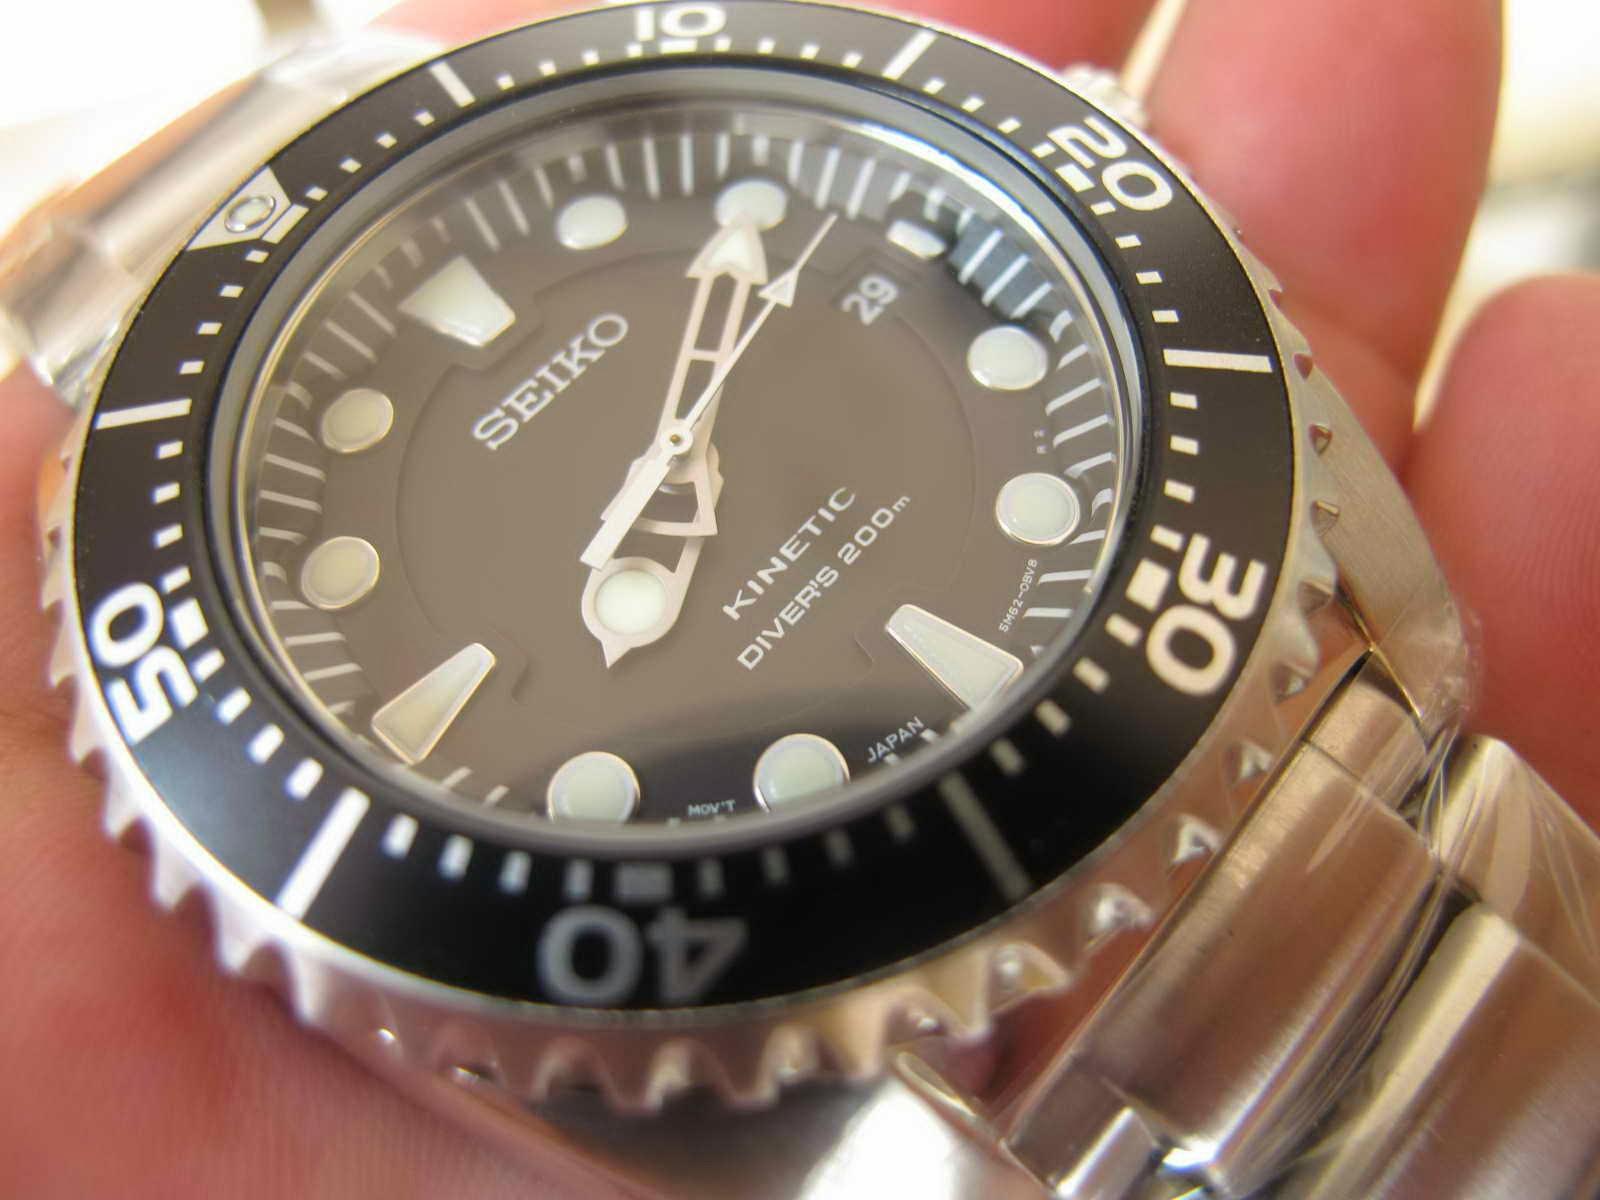 Cocok untuk Anda yang sedang mencari jam tangan Japan made.... performa  maco.... dapat dipakai sebagai jam tangan harian maupun Diving Sports. 1c3a466fc6